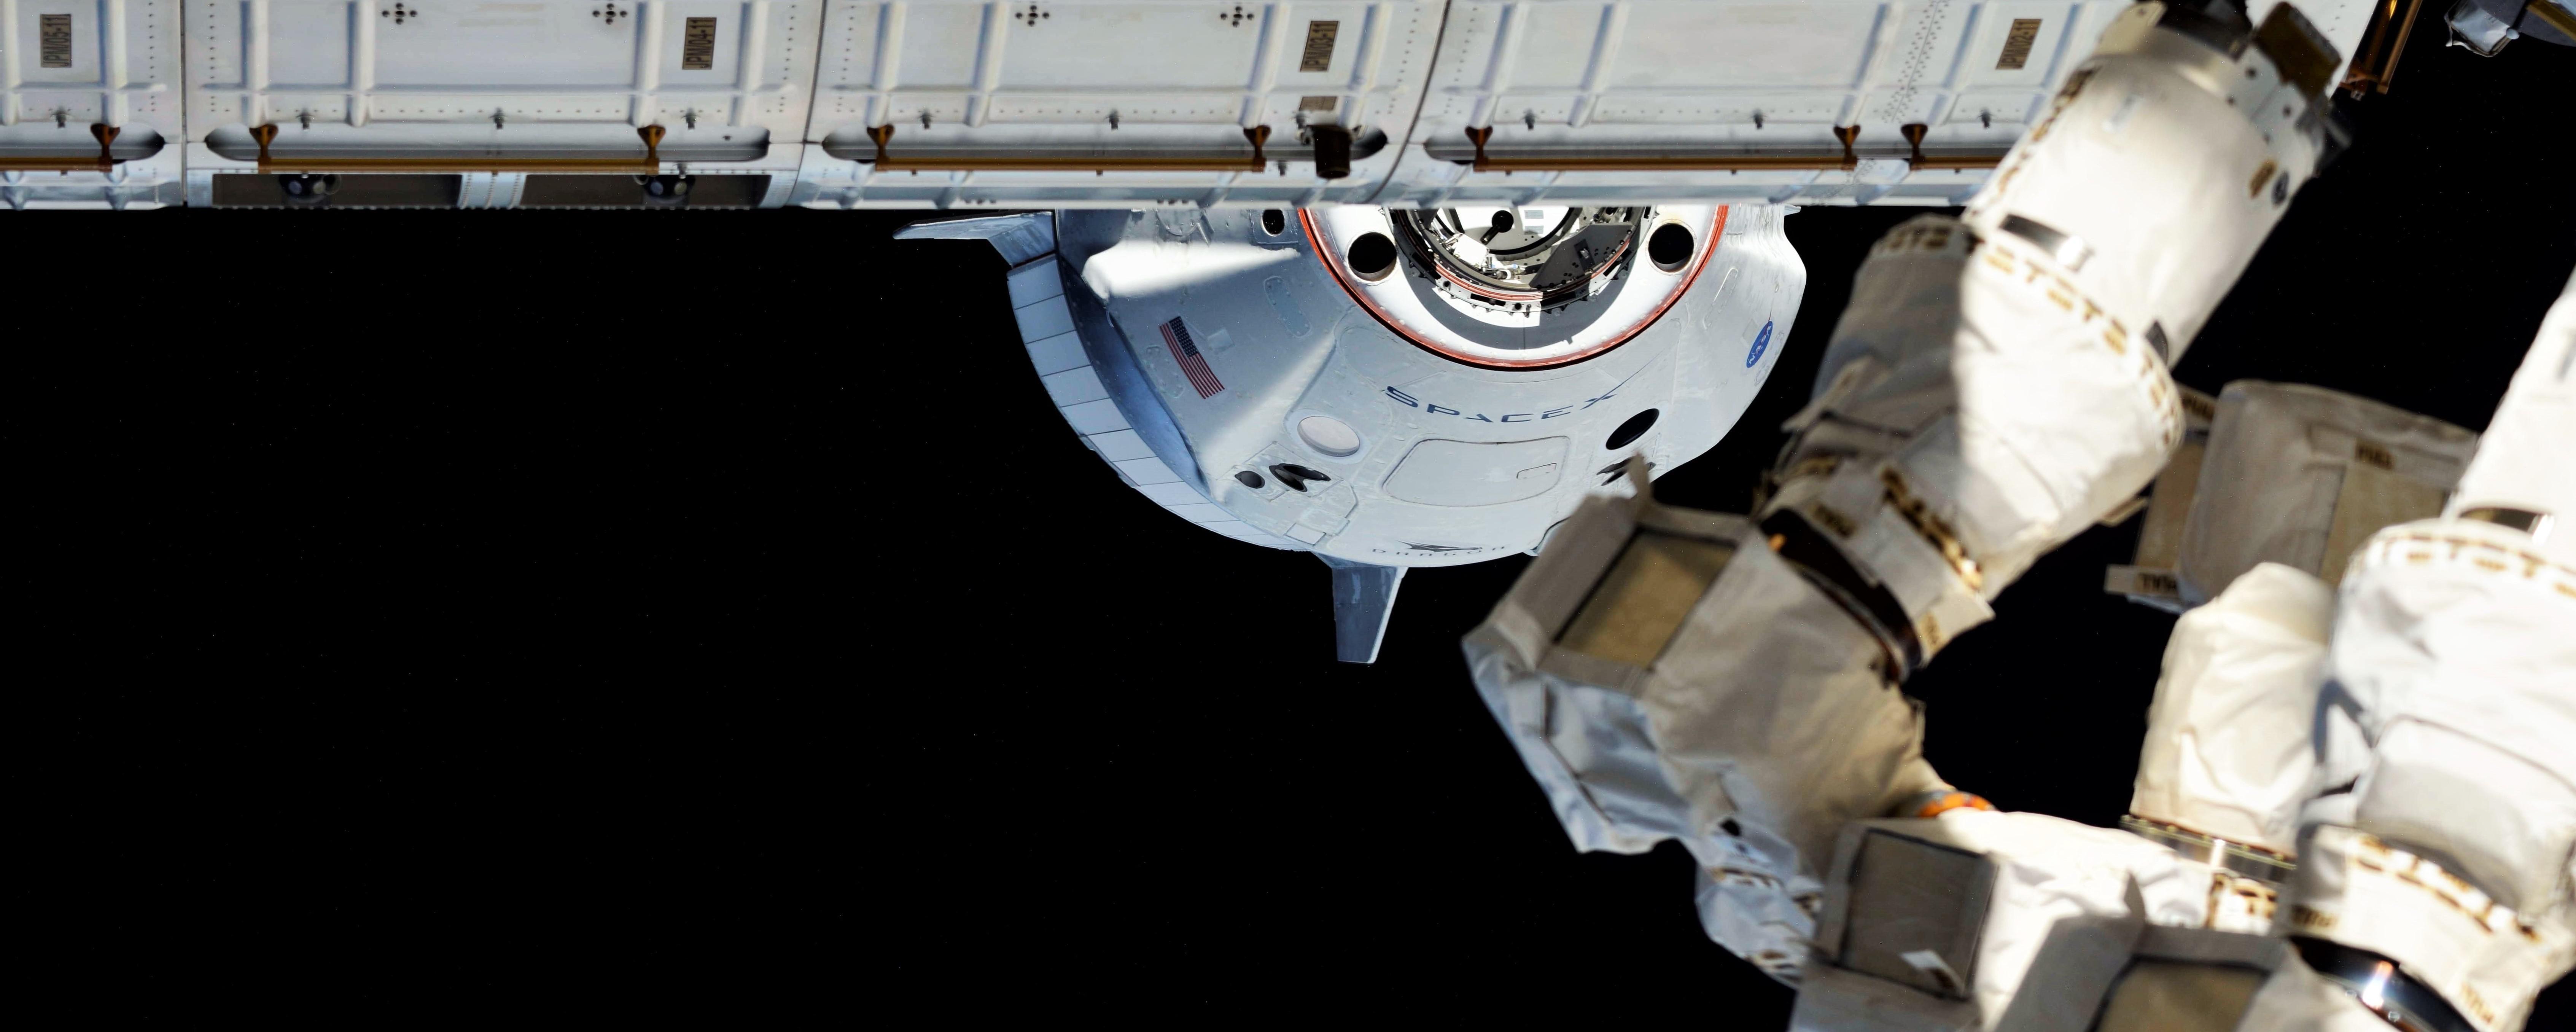 Crew Dragon DM-1 ISS arrival 030319 (Oleg Kononenko) 3 crop 2 (c)